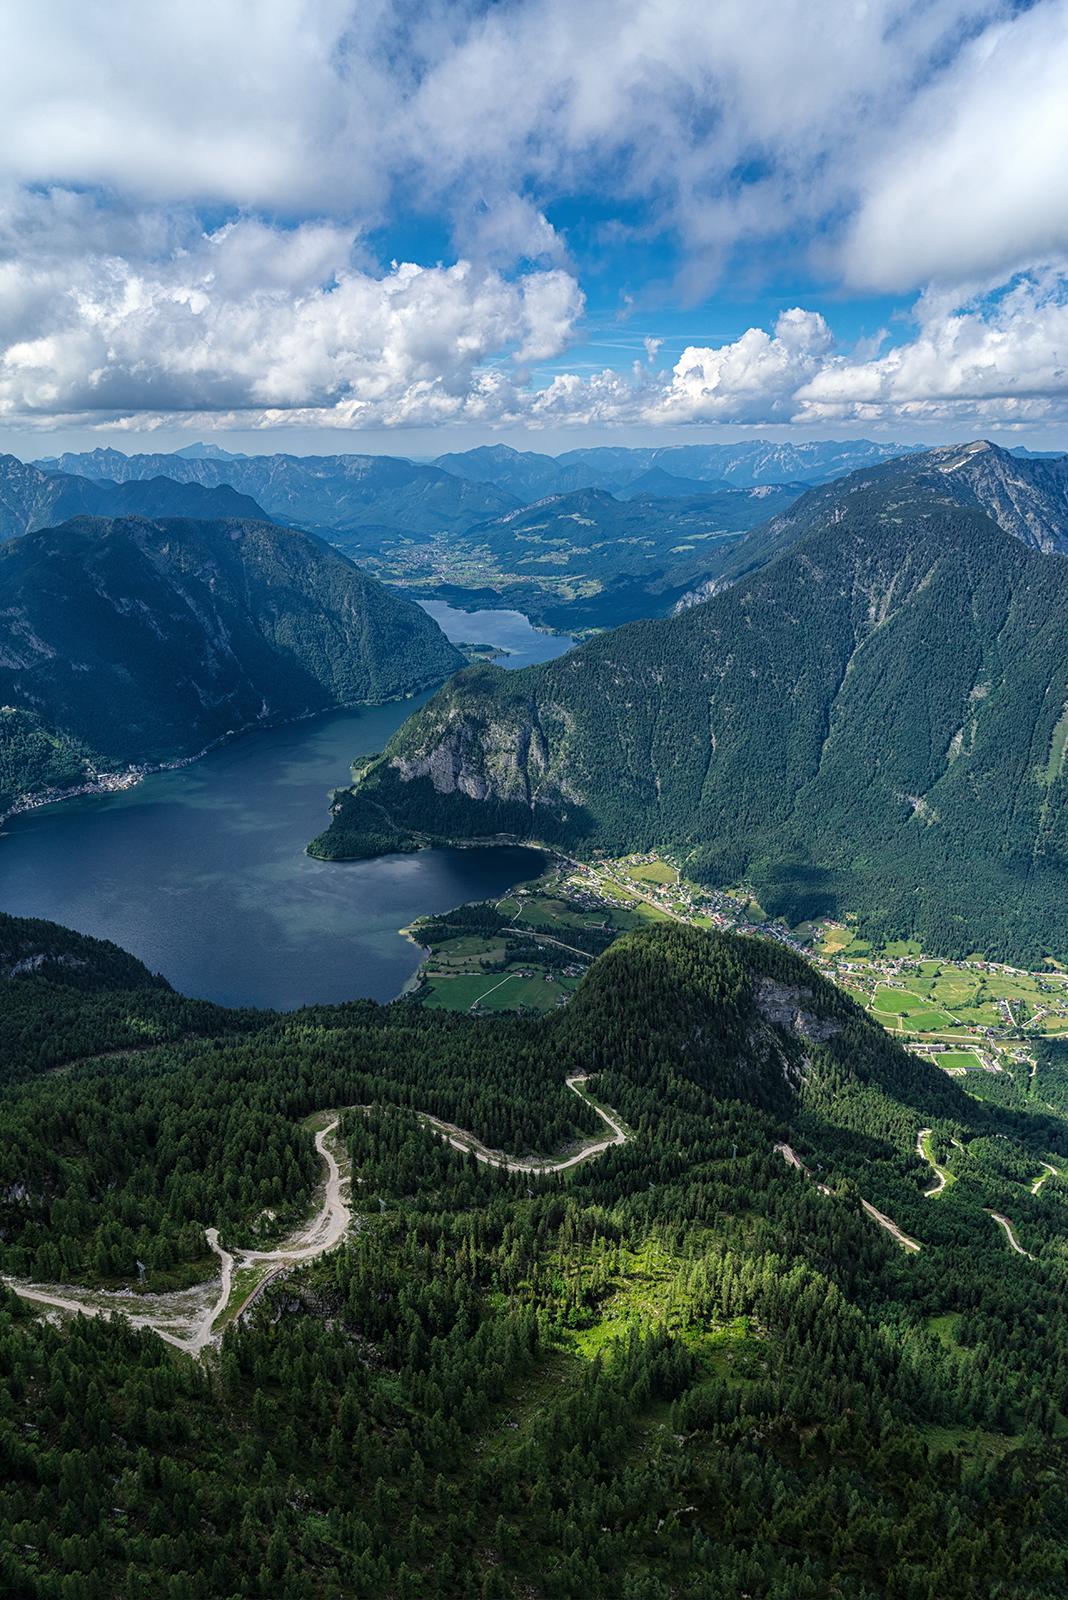 Salzkammergut, Austria, hallstatt, hdr, sony, sony a6500, landscape, mountains, threes, road, water, sky, villages